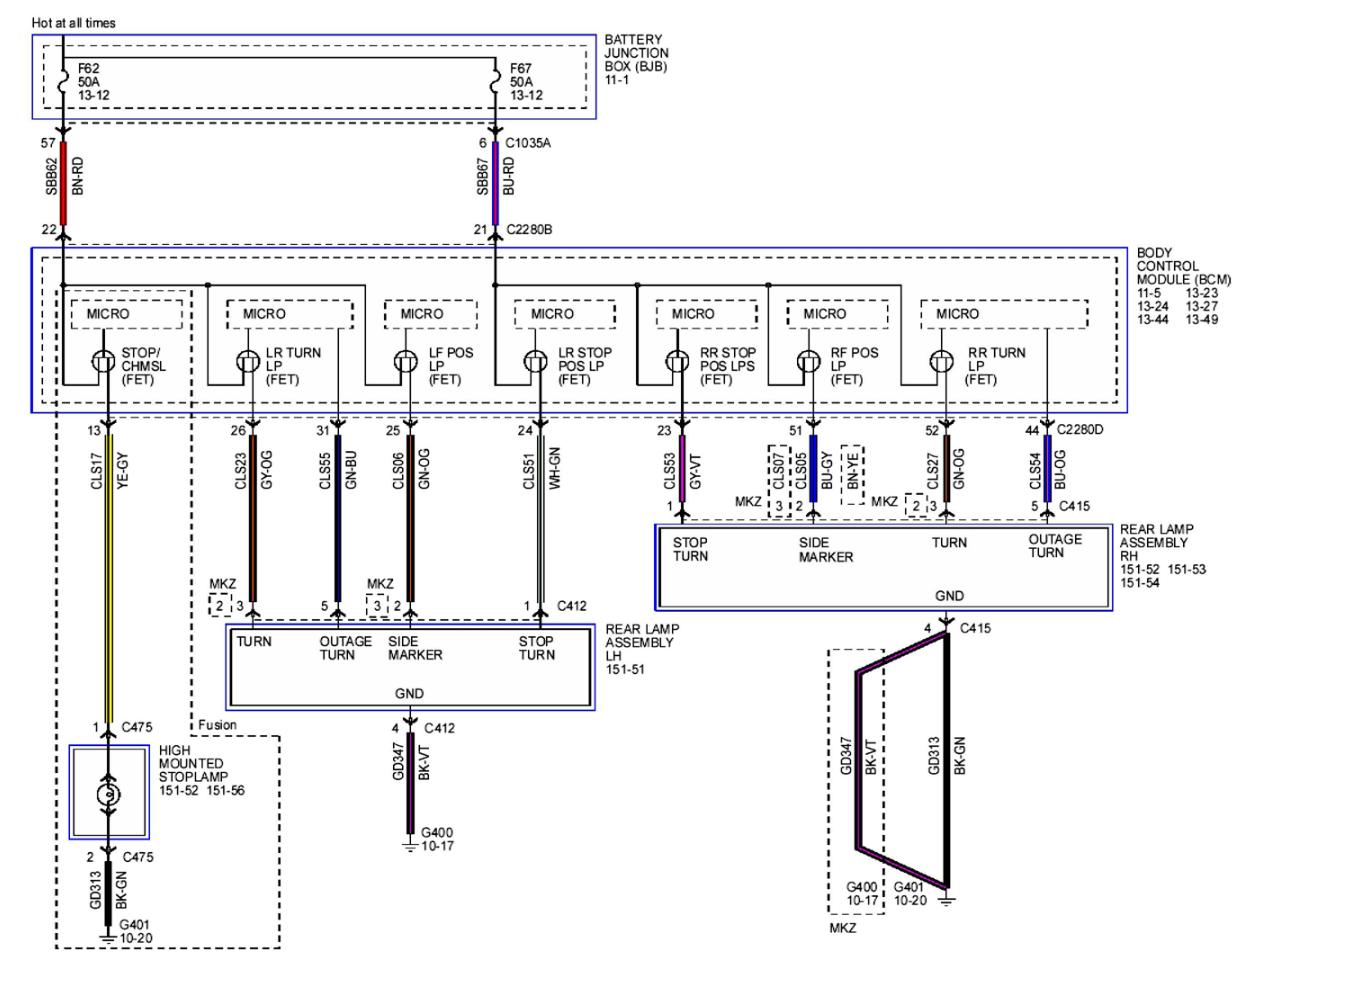 Diagram  2009 Lincoln Mkz Wiring Diagram Full Version Hd